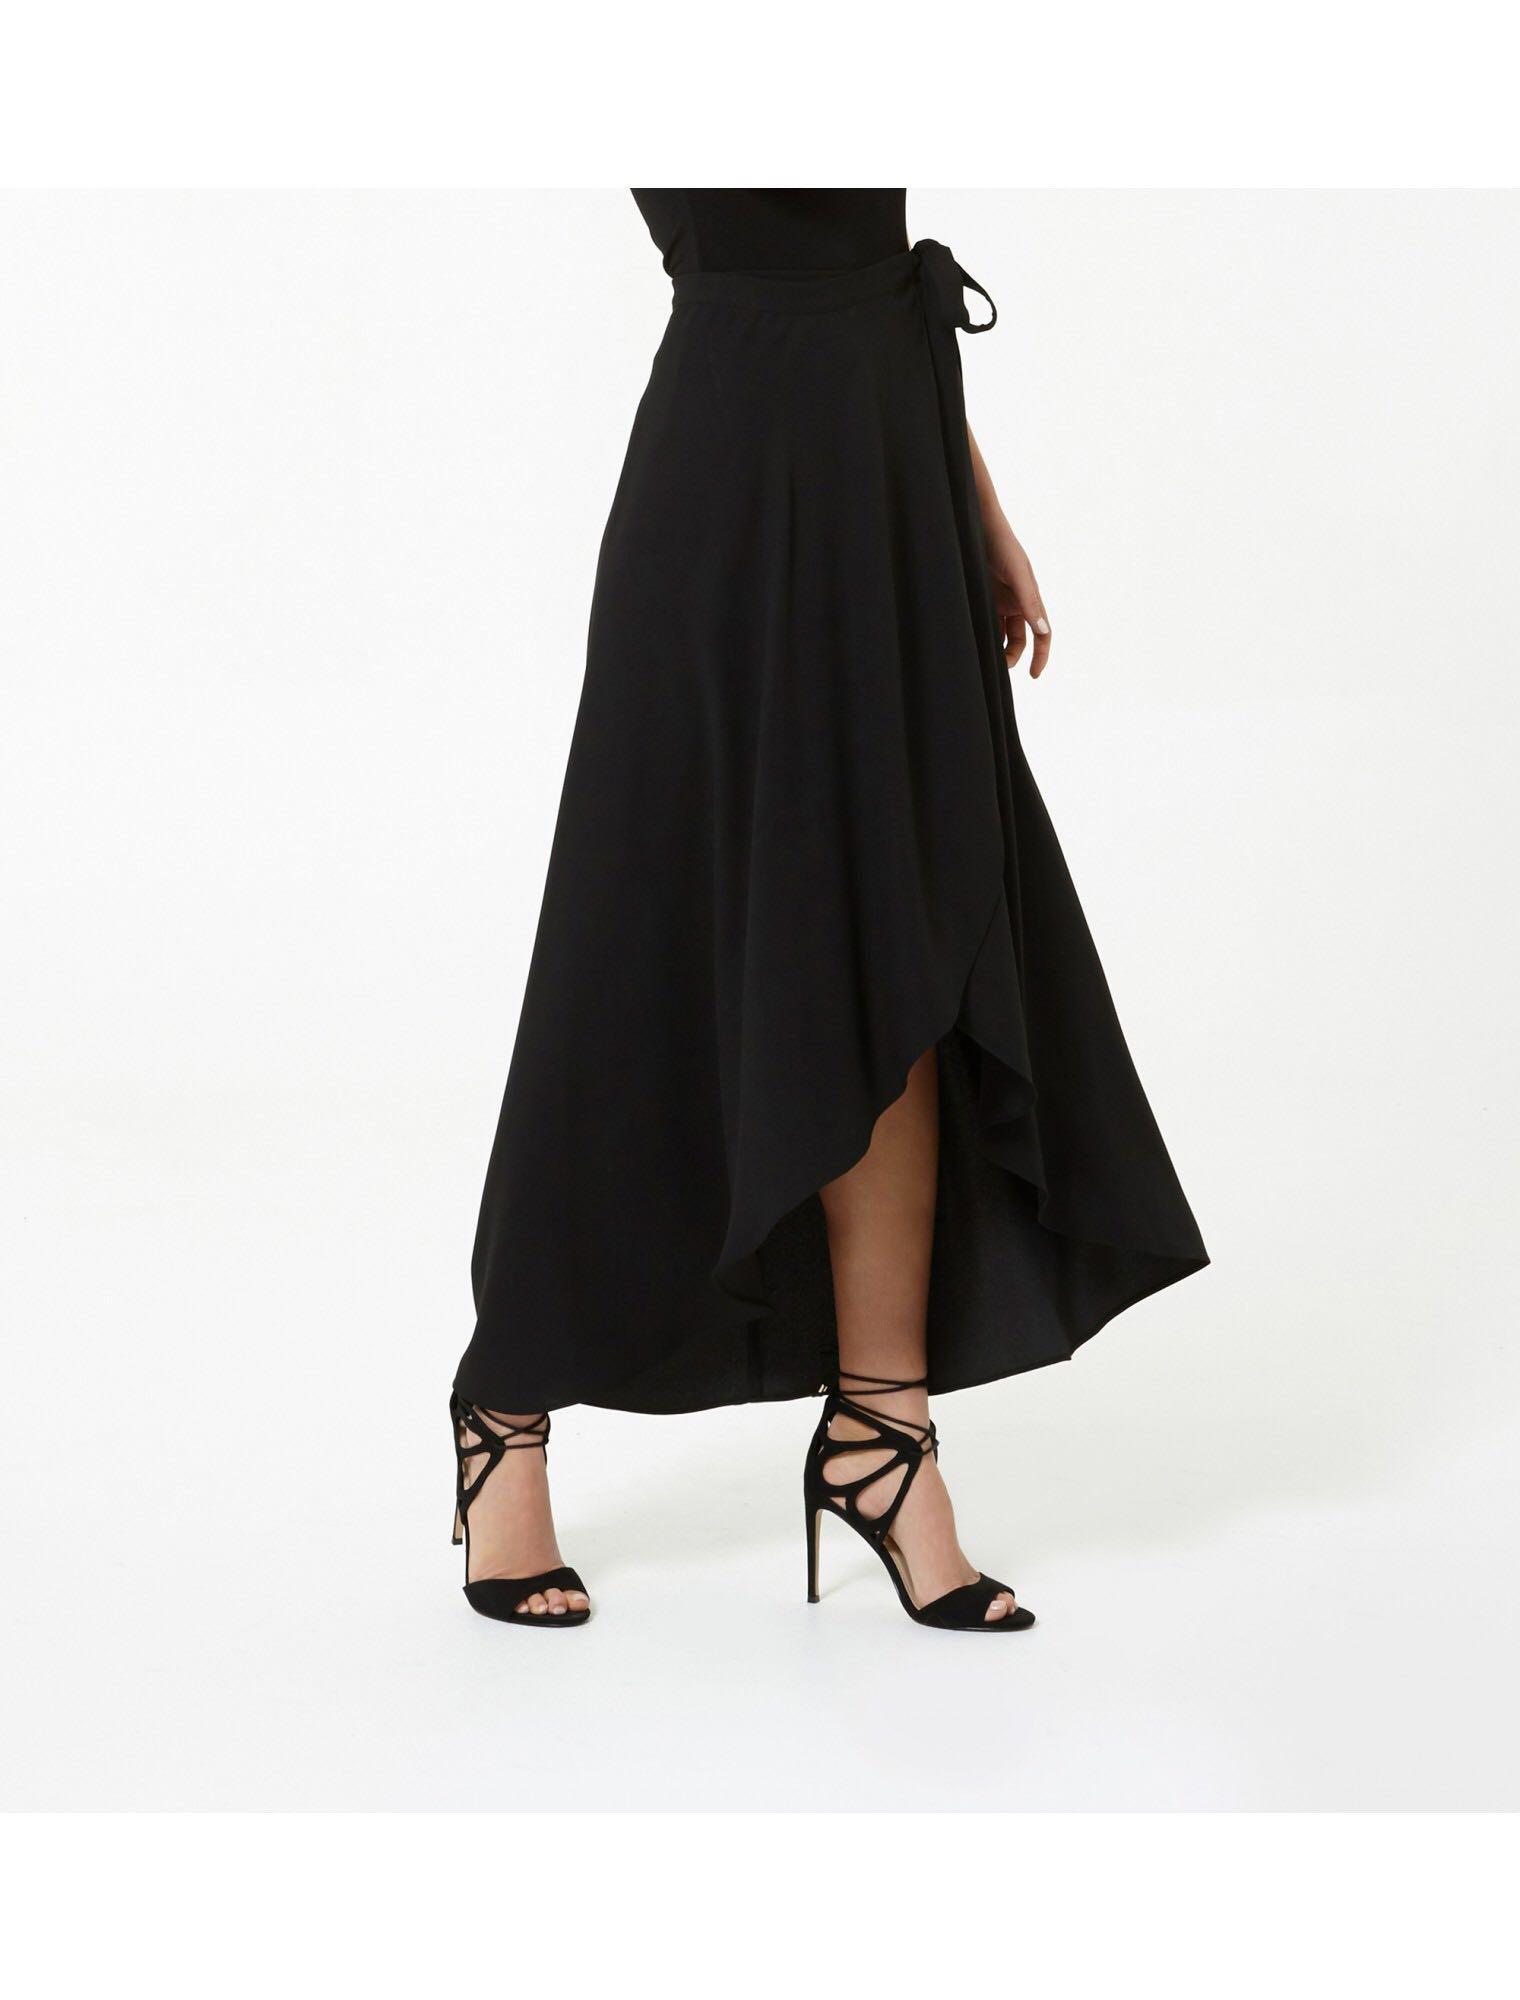 b79e61afa1 Black wrap maxi skirt, Women's Fashion, Clothes, Dresses & Skirts on ...